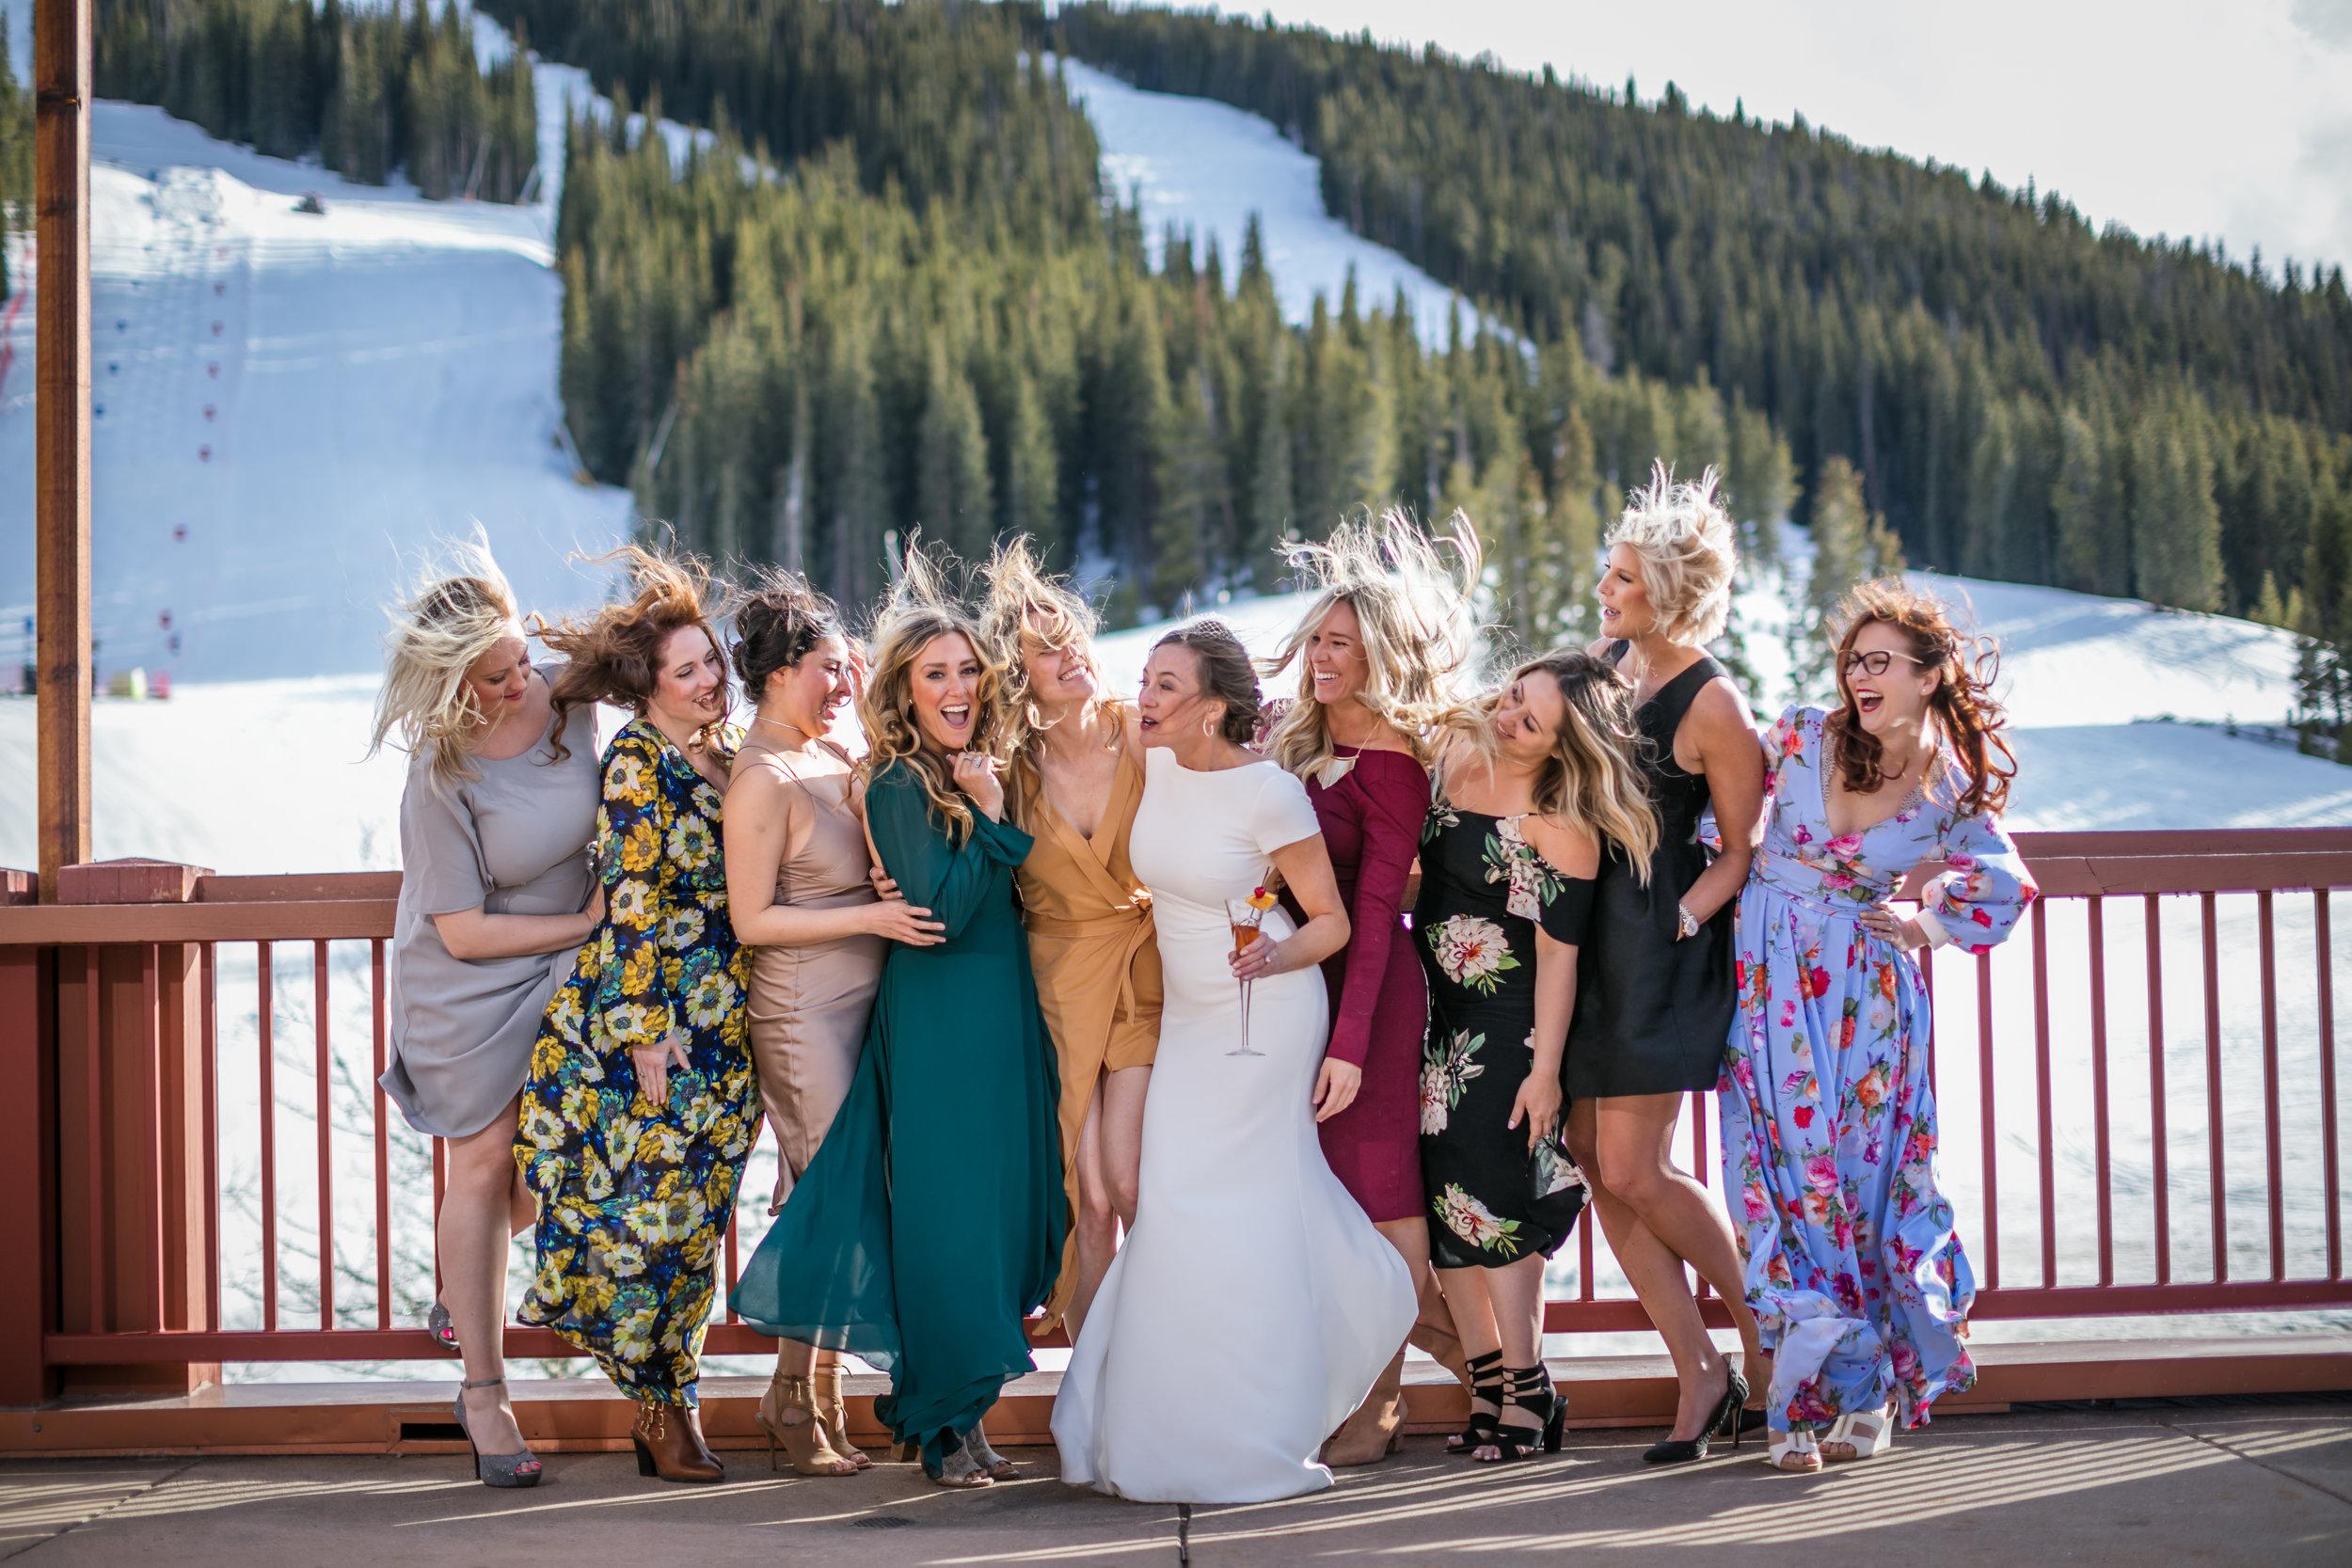 vild-photography-photographer-colorado-intimate-wedding-adventure-Stephanie- Adam-518.jpg